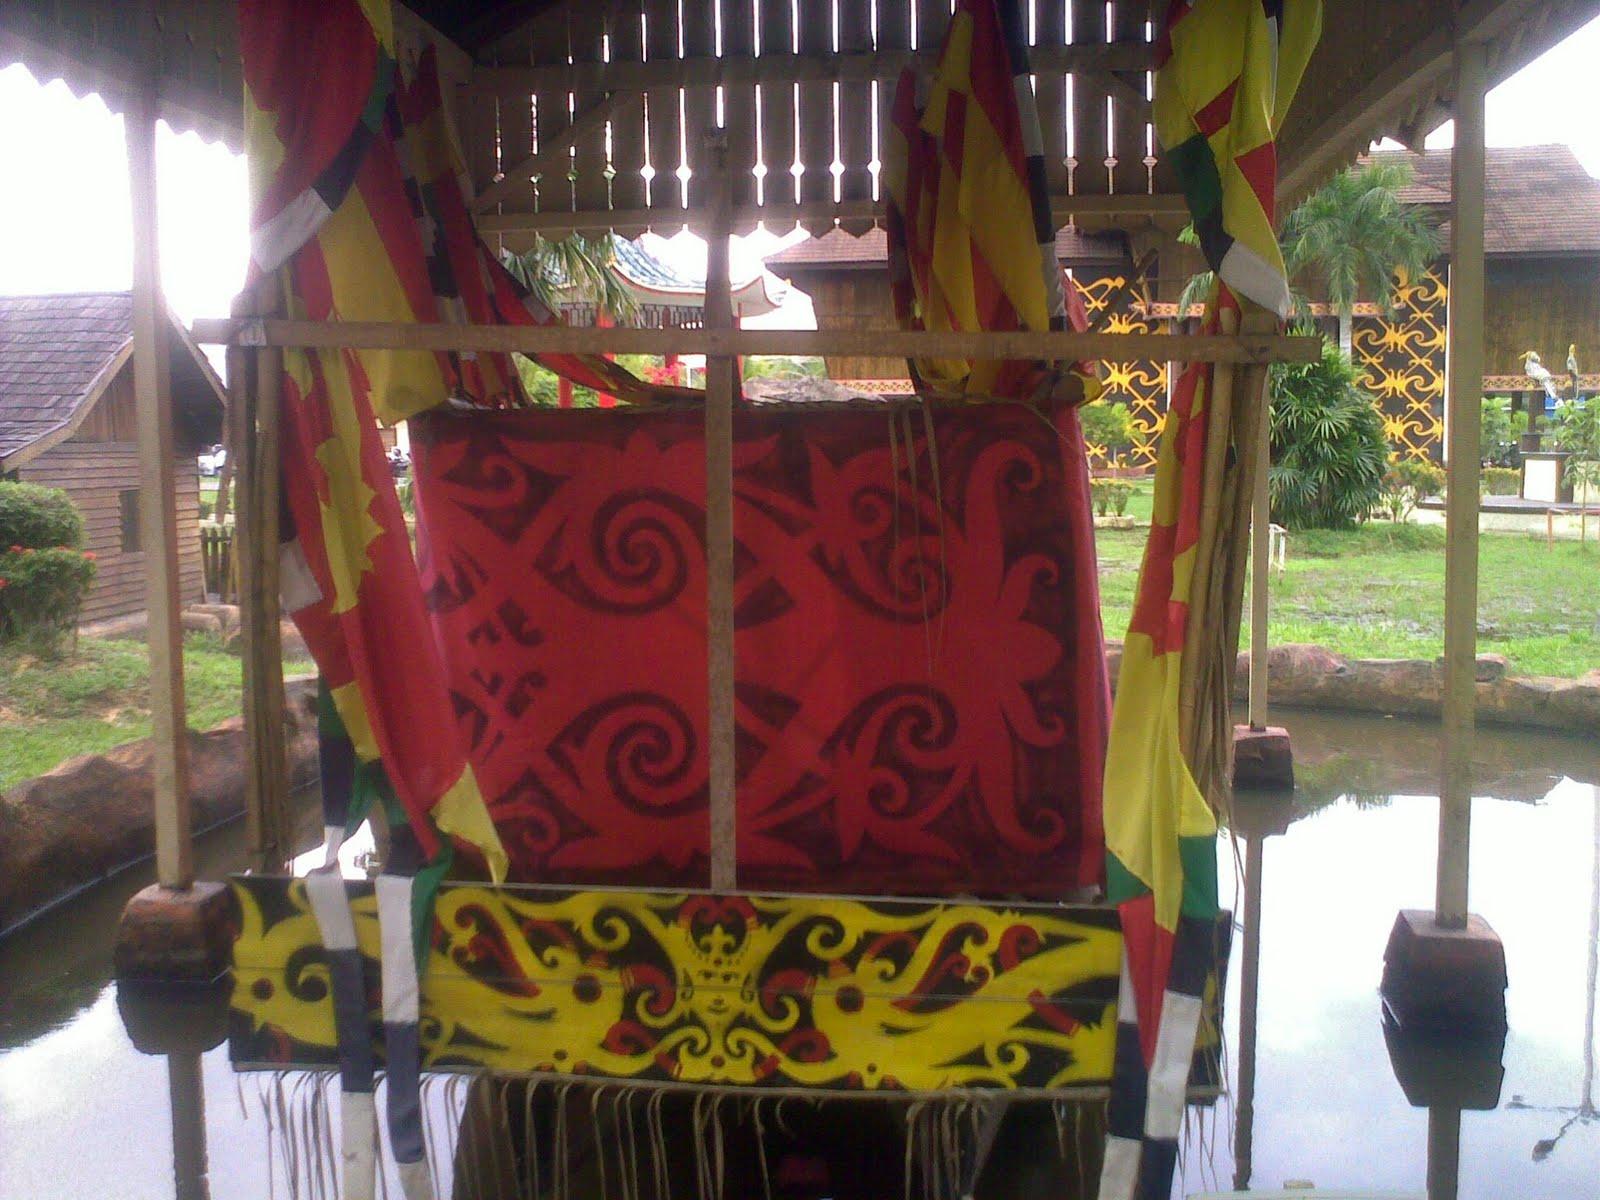 Pecidasase 2011 Satu Diantara Budaya Penduduk Asli Kalbar Dayak Perahu